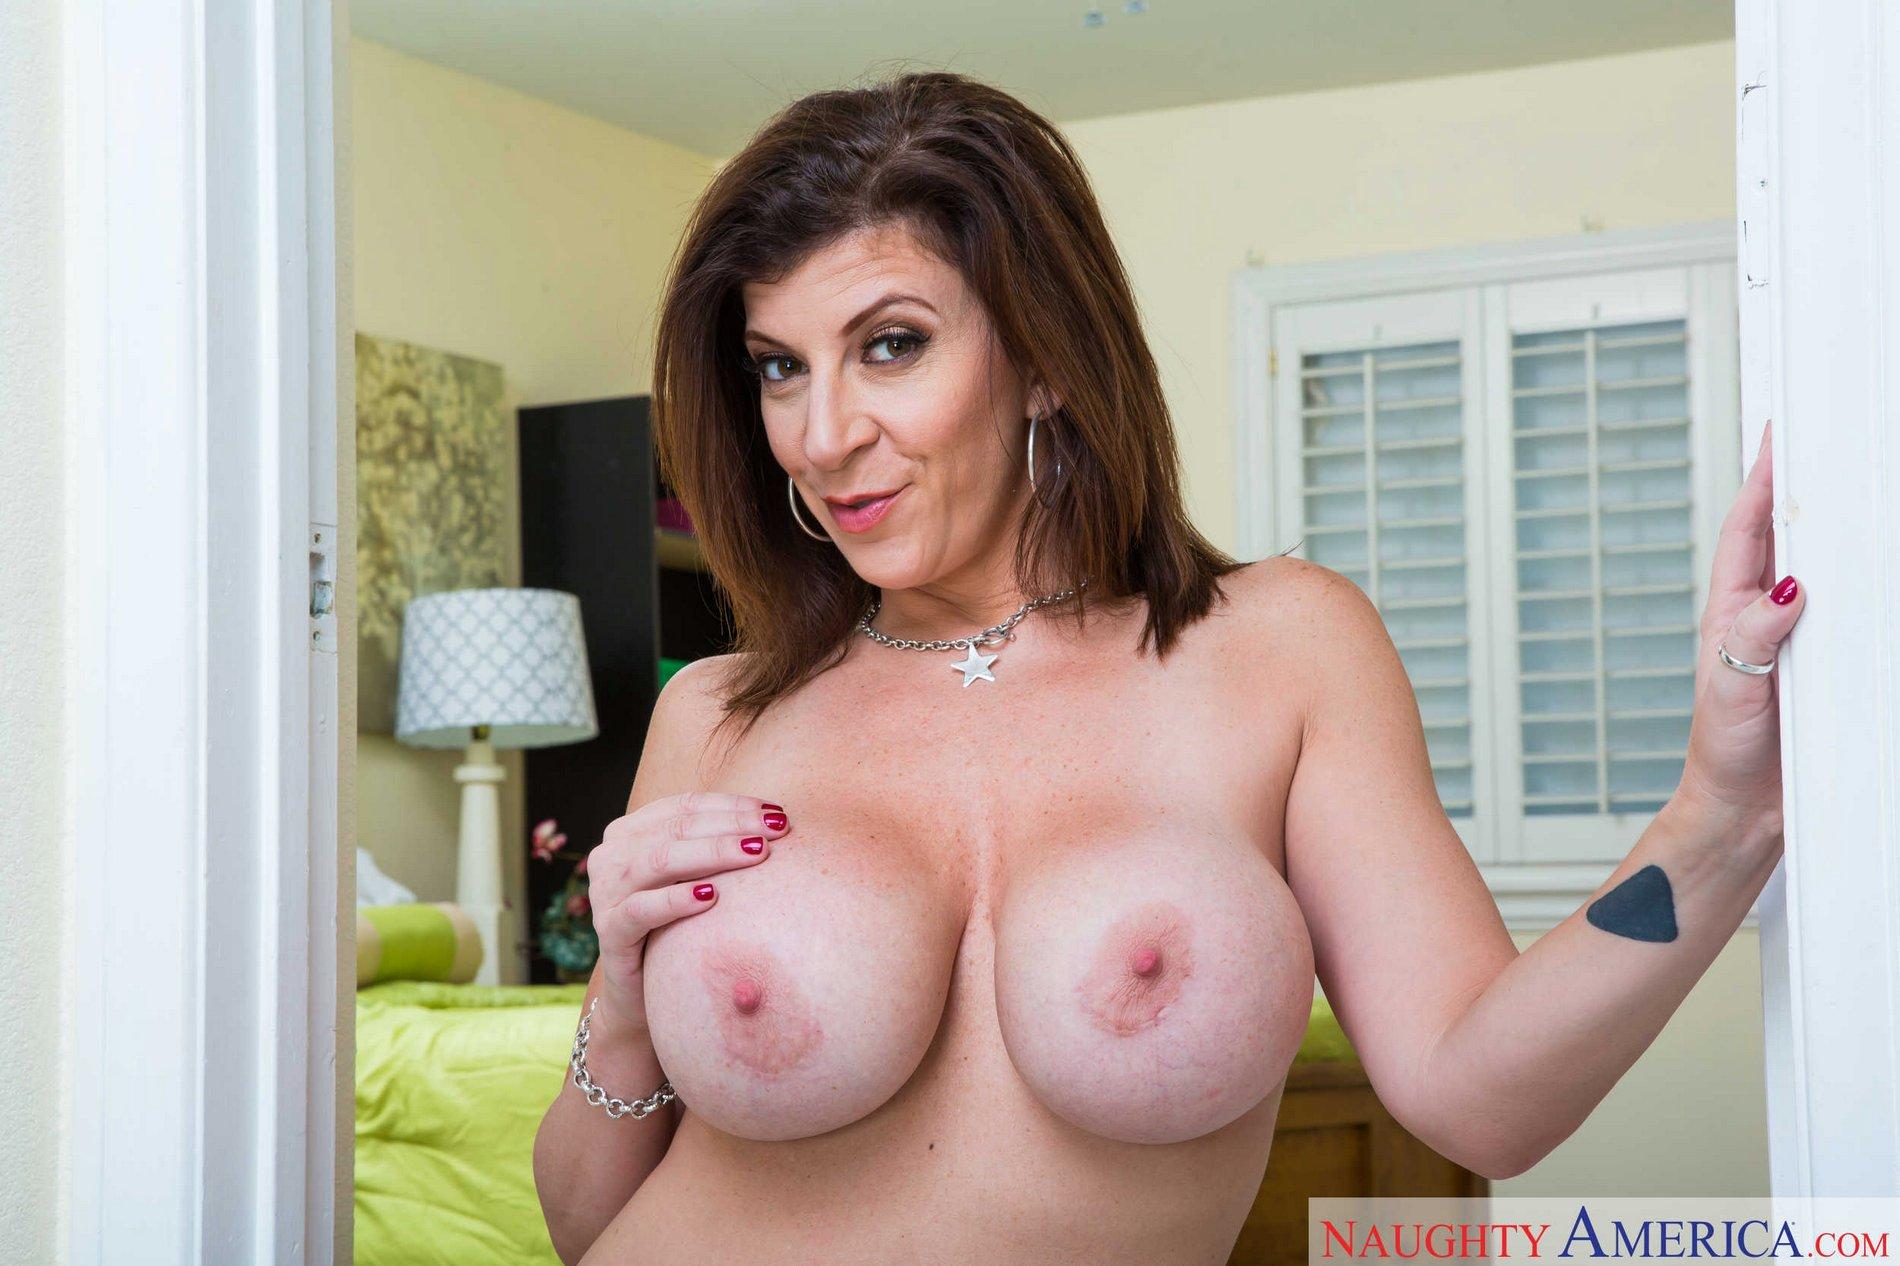 Watch Sara jay topless video